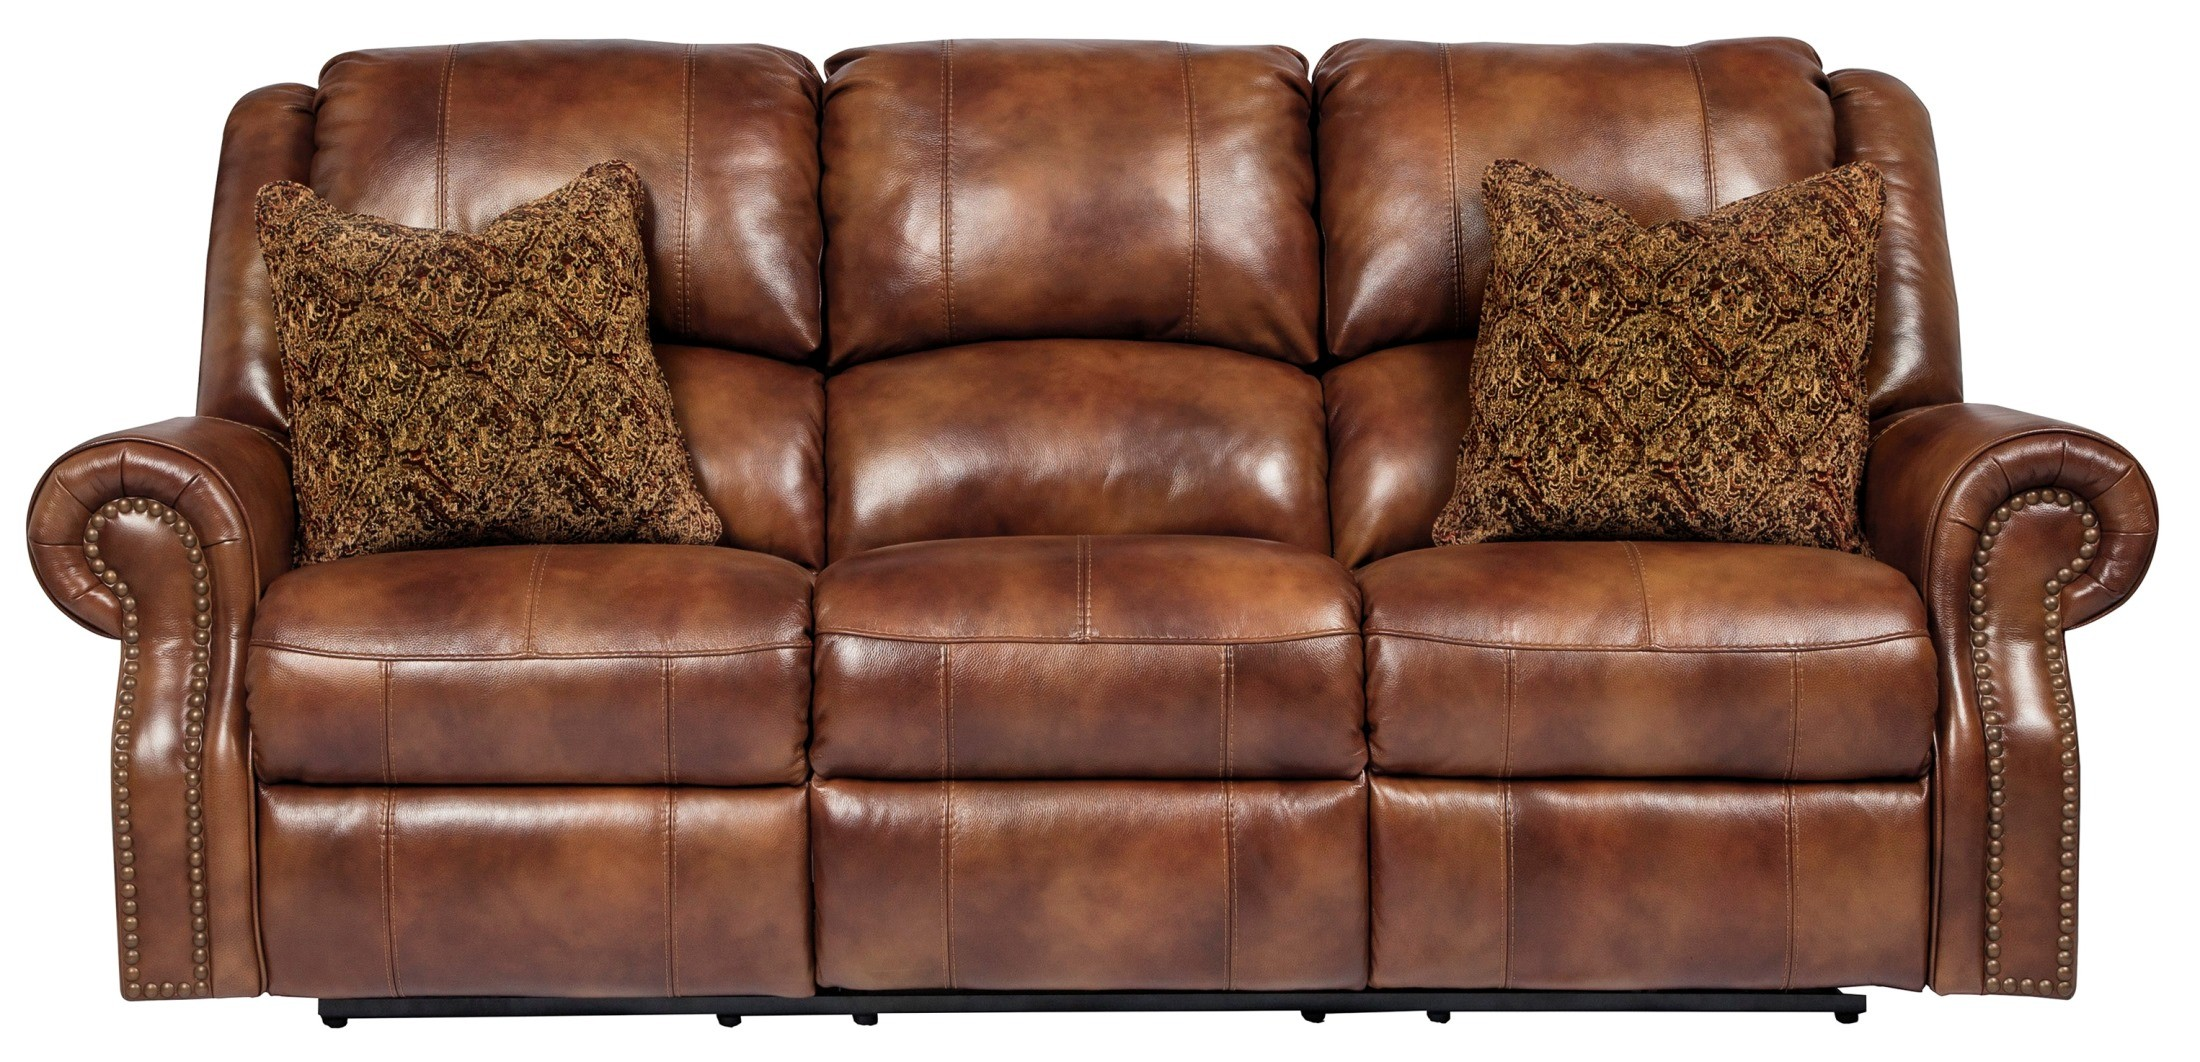 Walworth Auburn Reclining Living Room Set From Ashley U78001 88 86 Colema